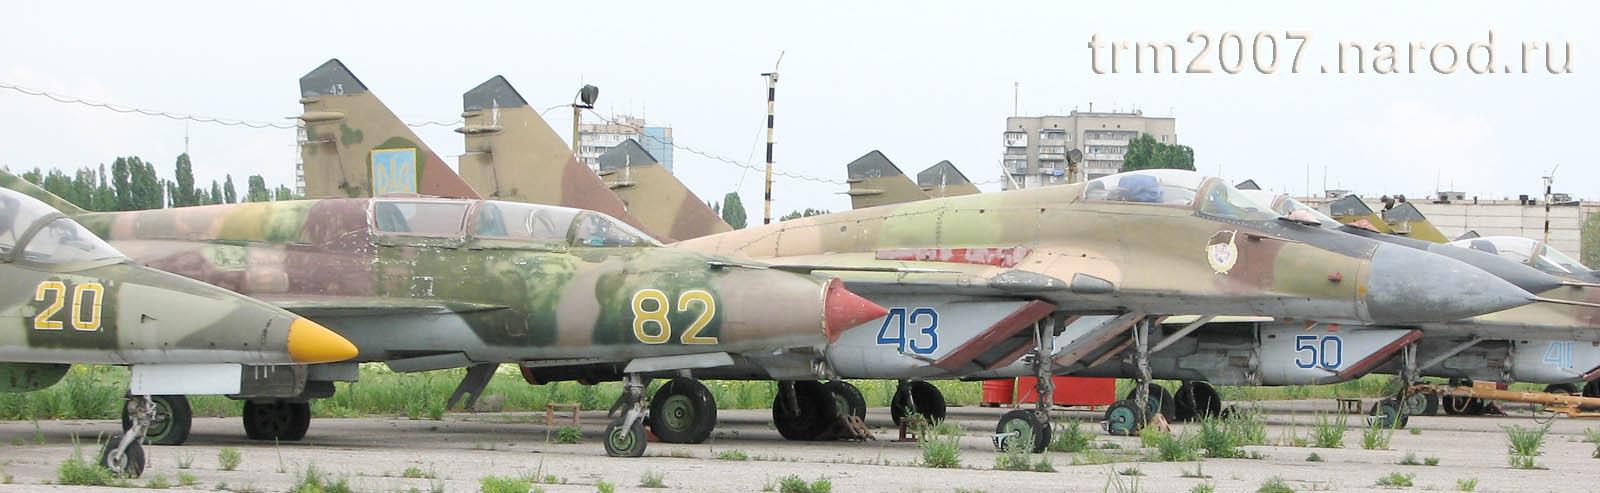 СУ-27 на Школьном аэродроме в Одессе